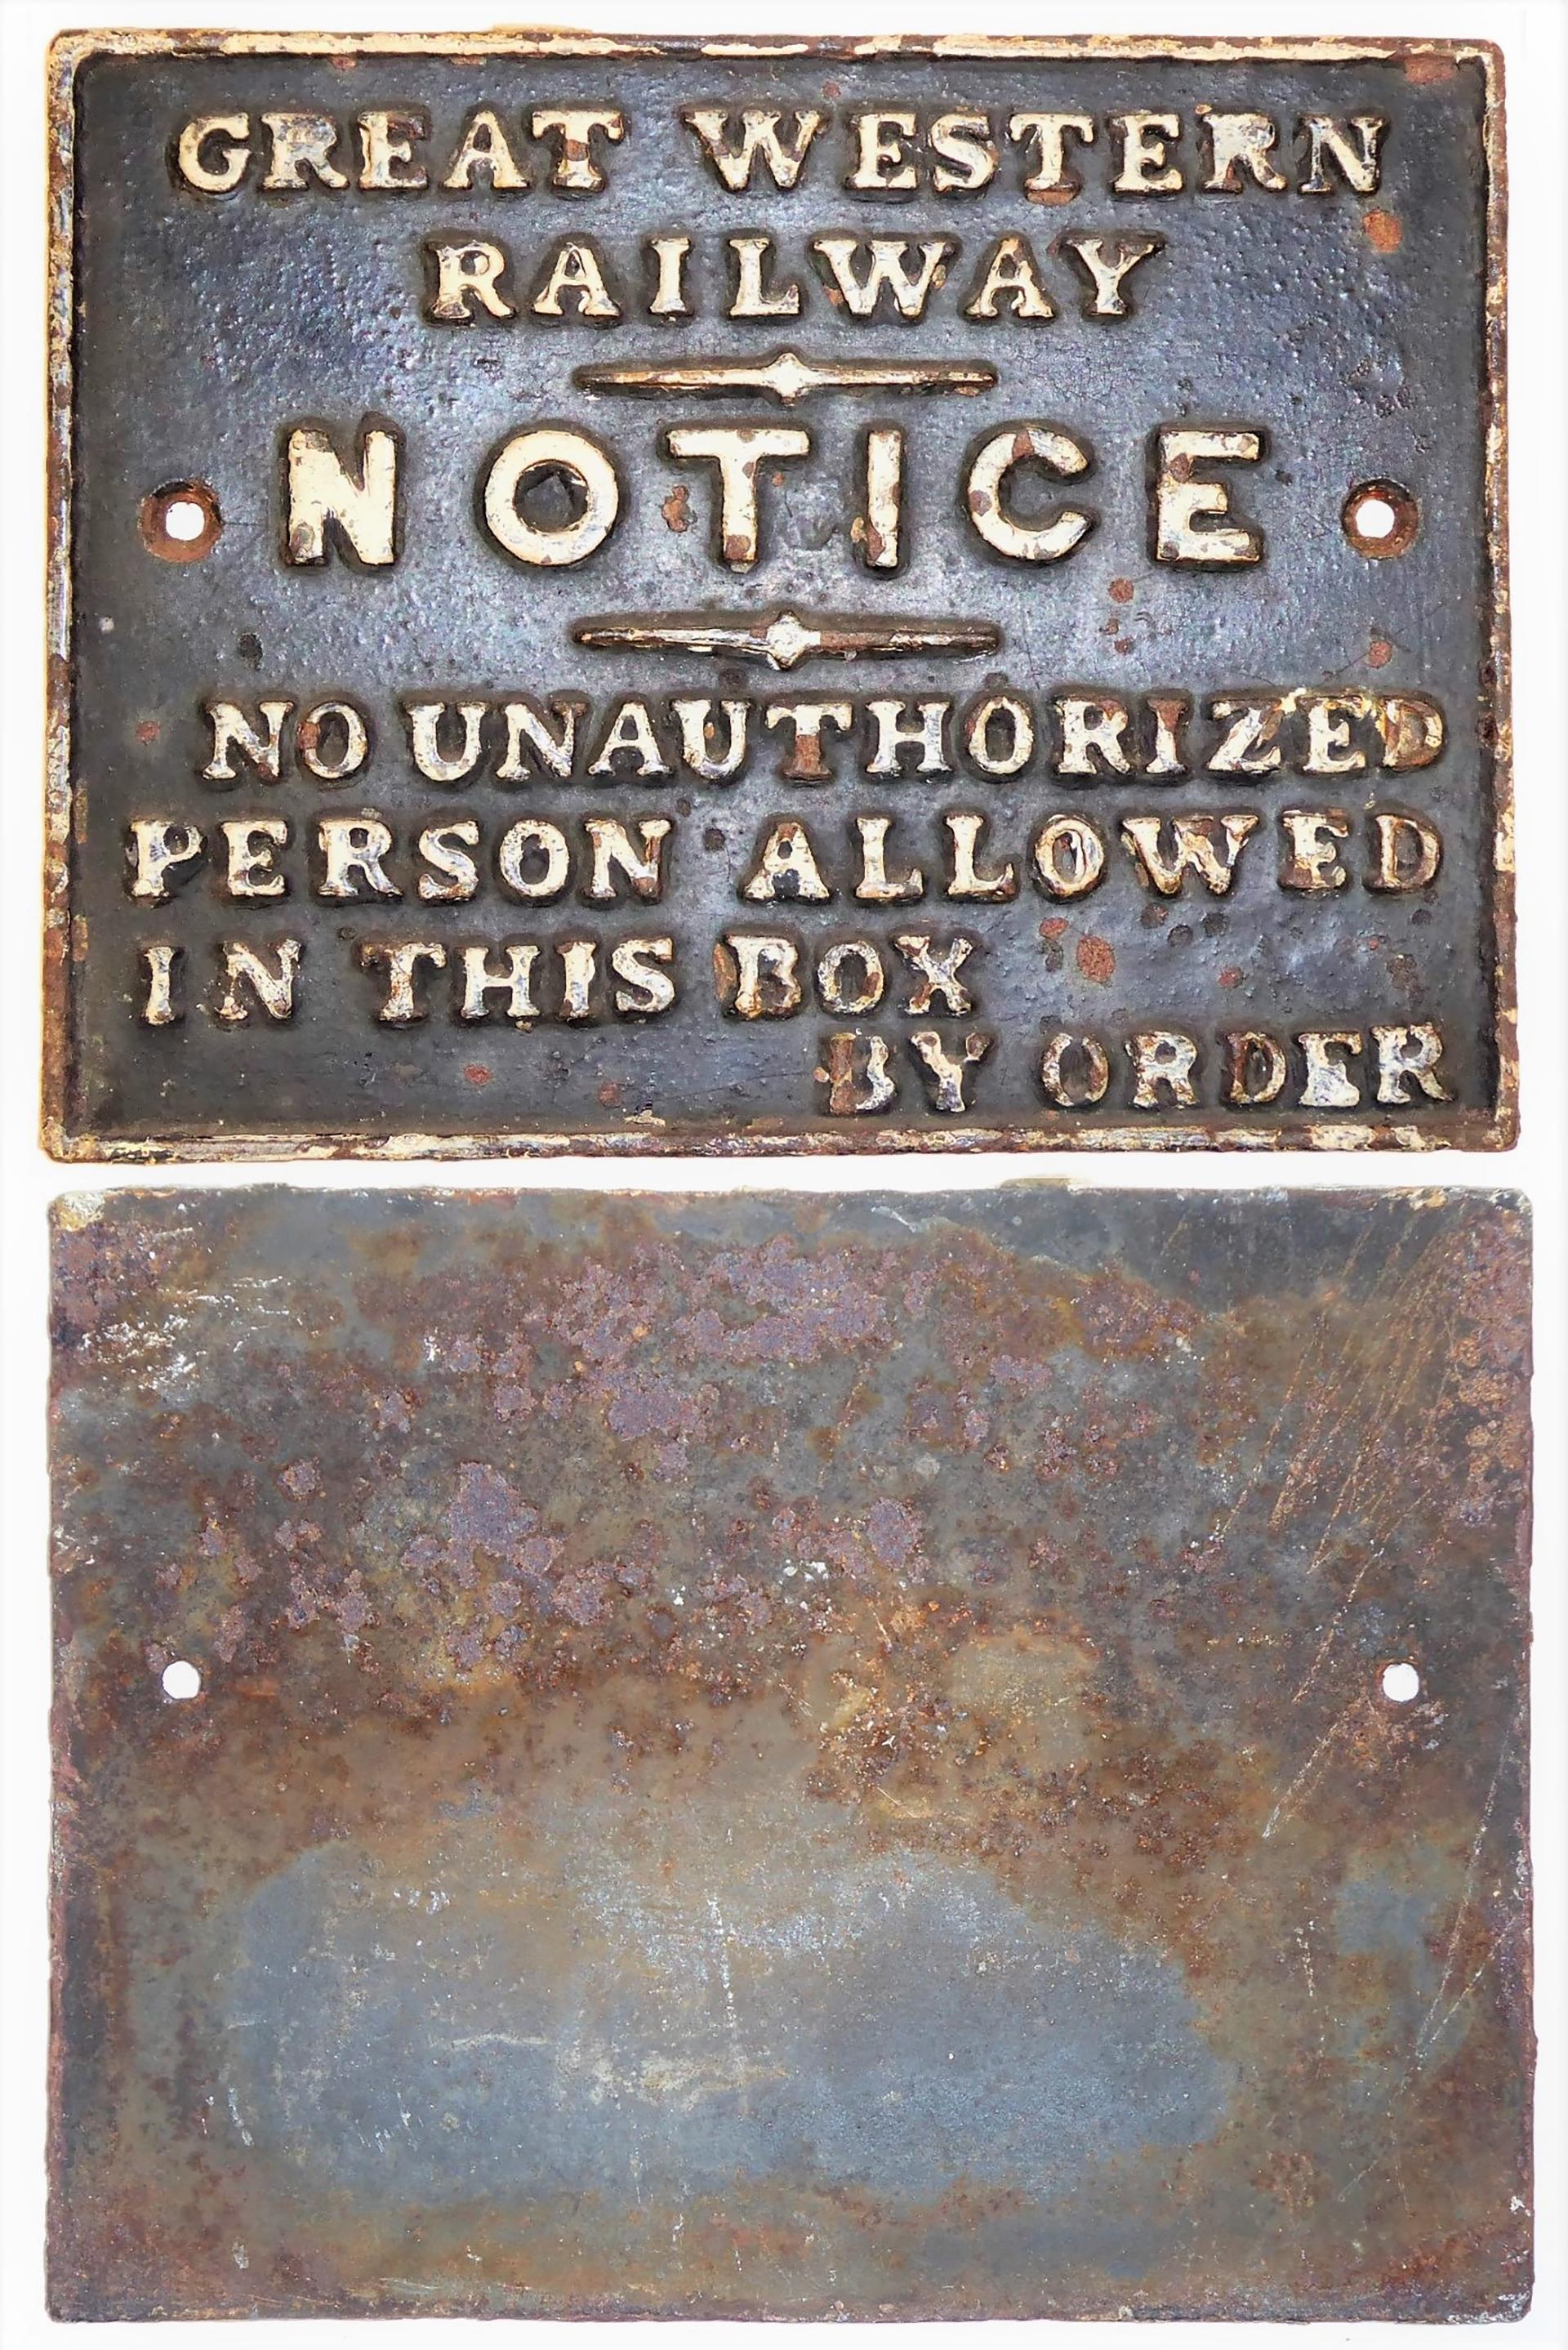 GWR Cast Iron Signal Box door notice. No Unauthorized persons etc in good original condition.